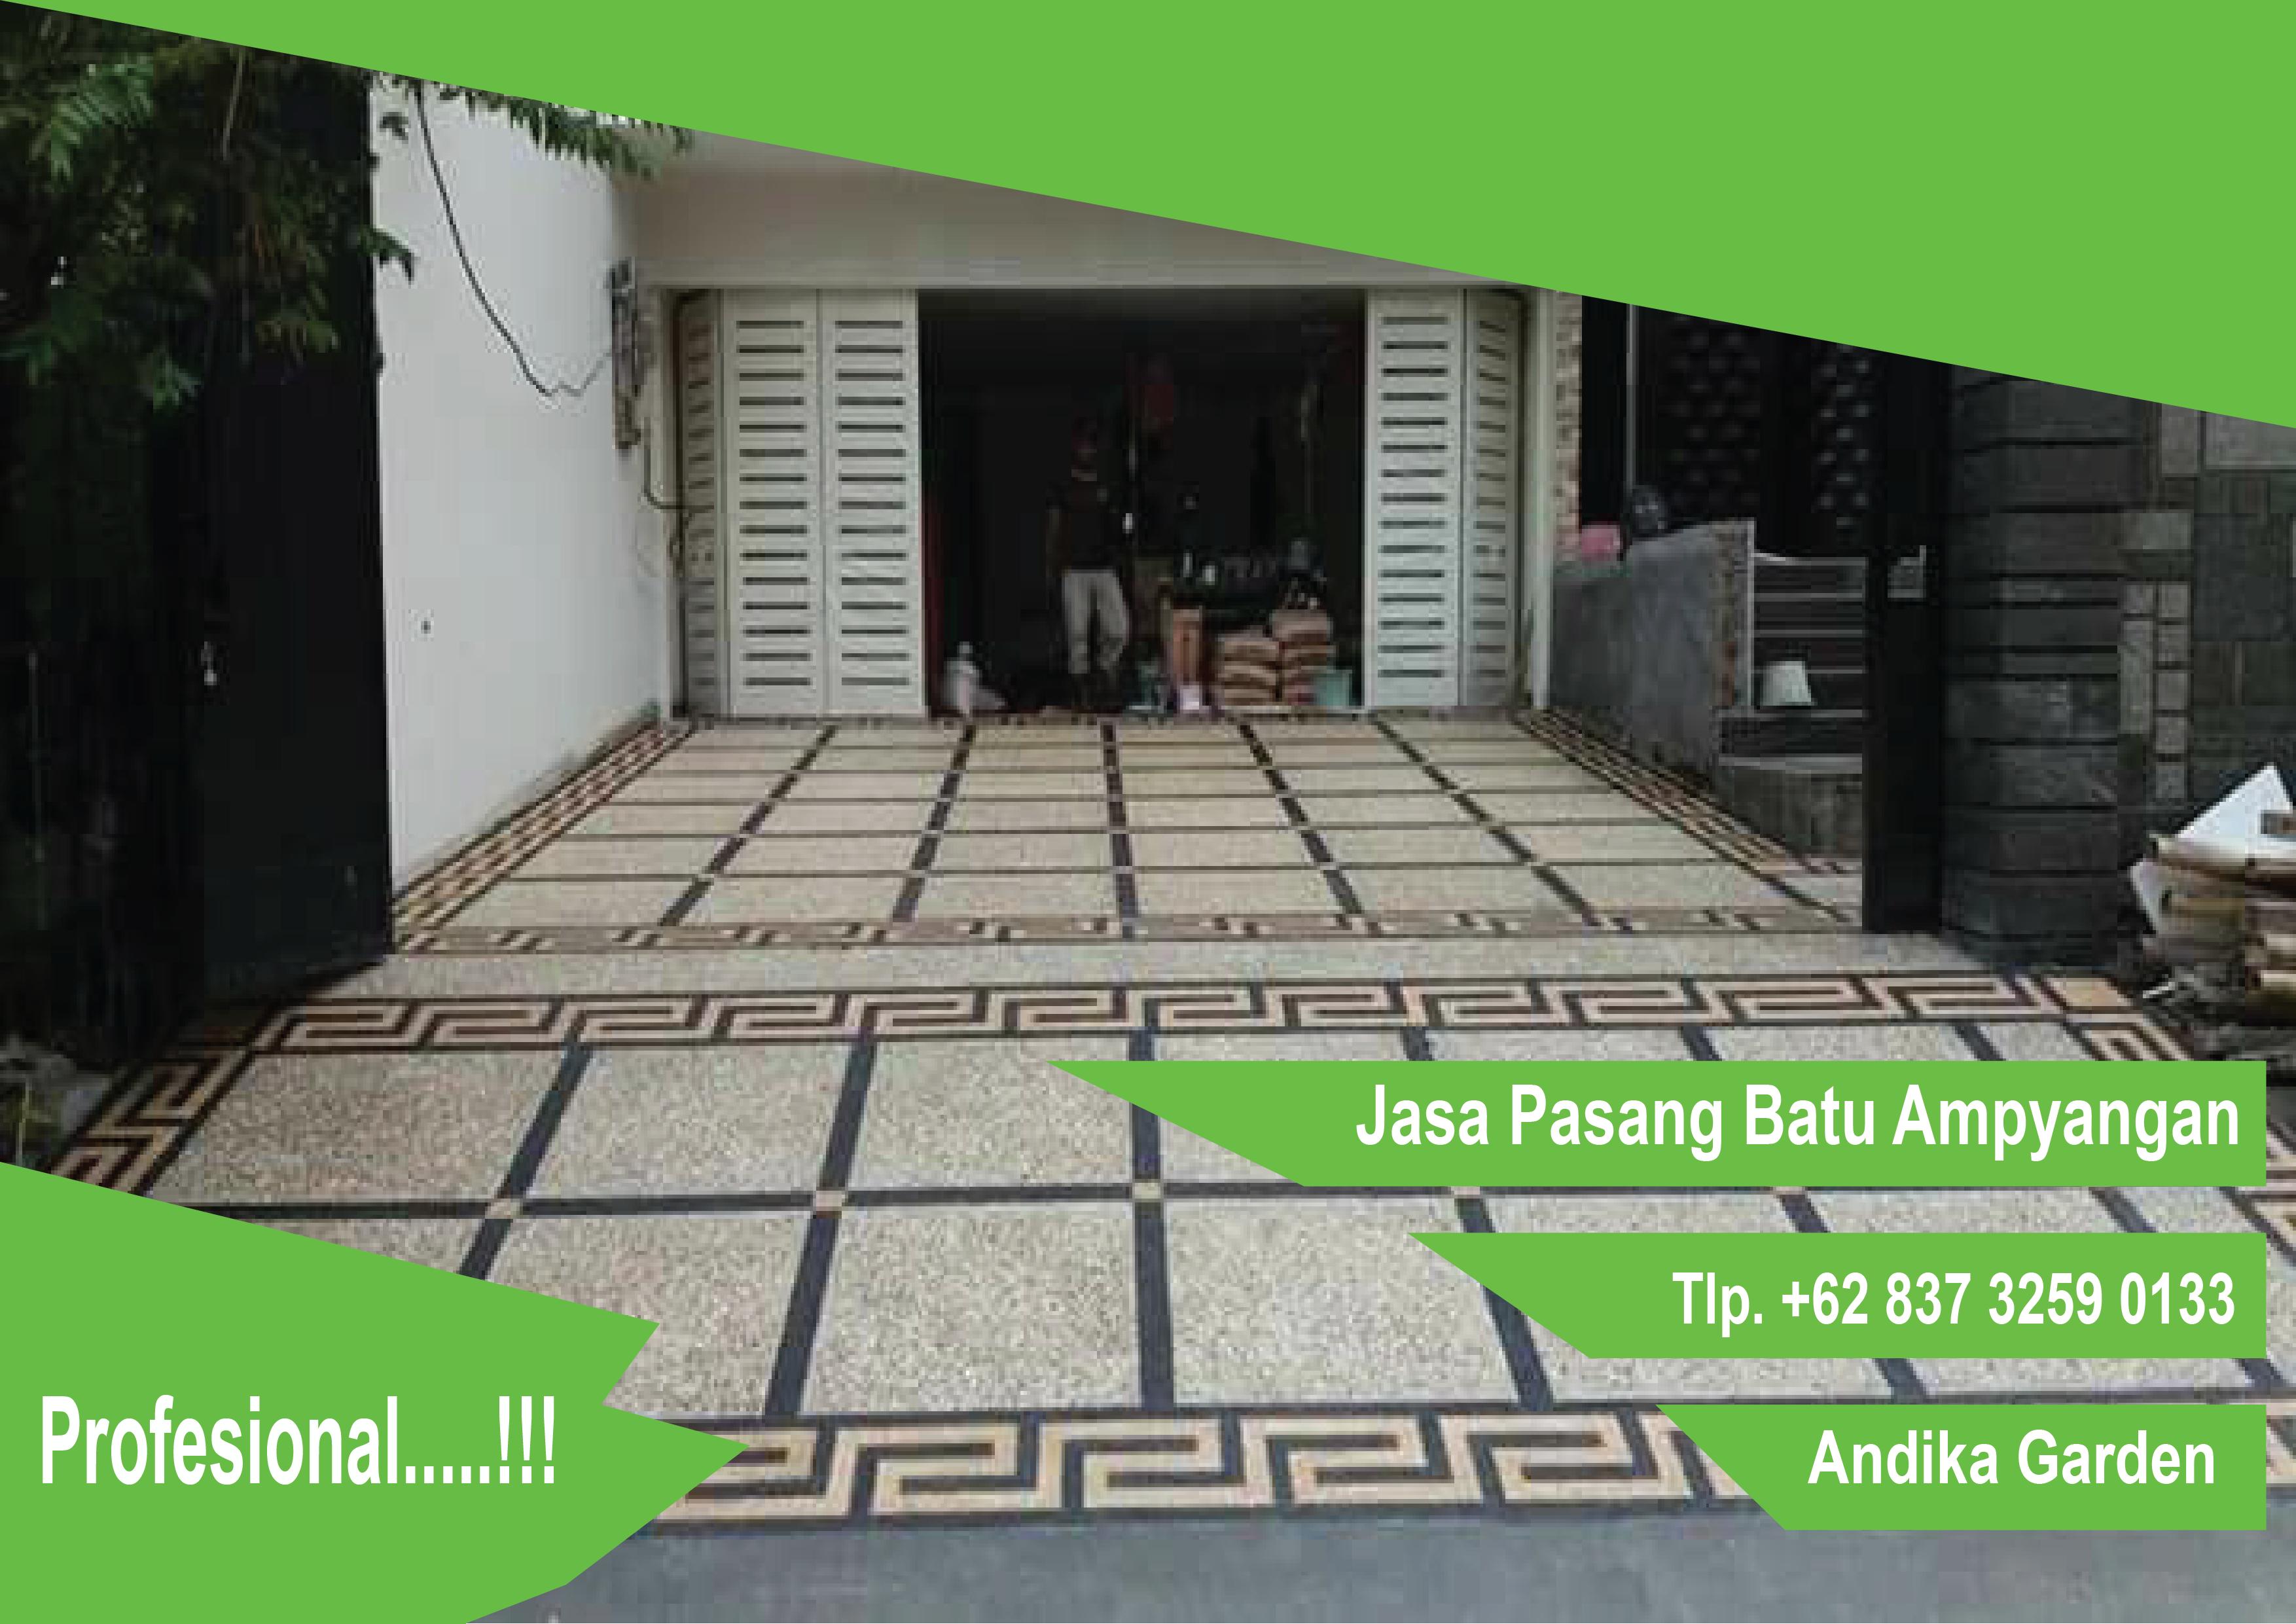 Lantai Garasi Murah Meriah Wa 62 857 3259 0133 Andika Garden In 2020 Carport Indoor Garden Rock Decor